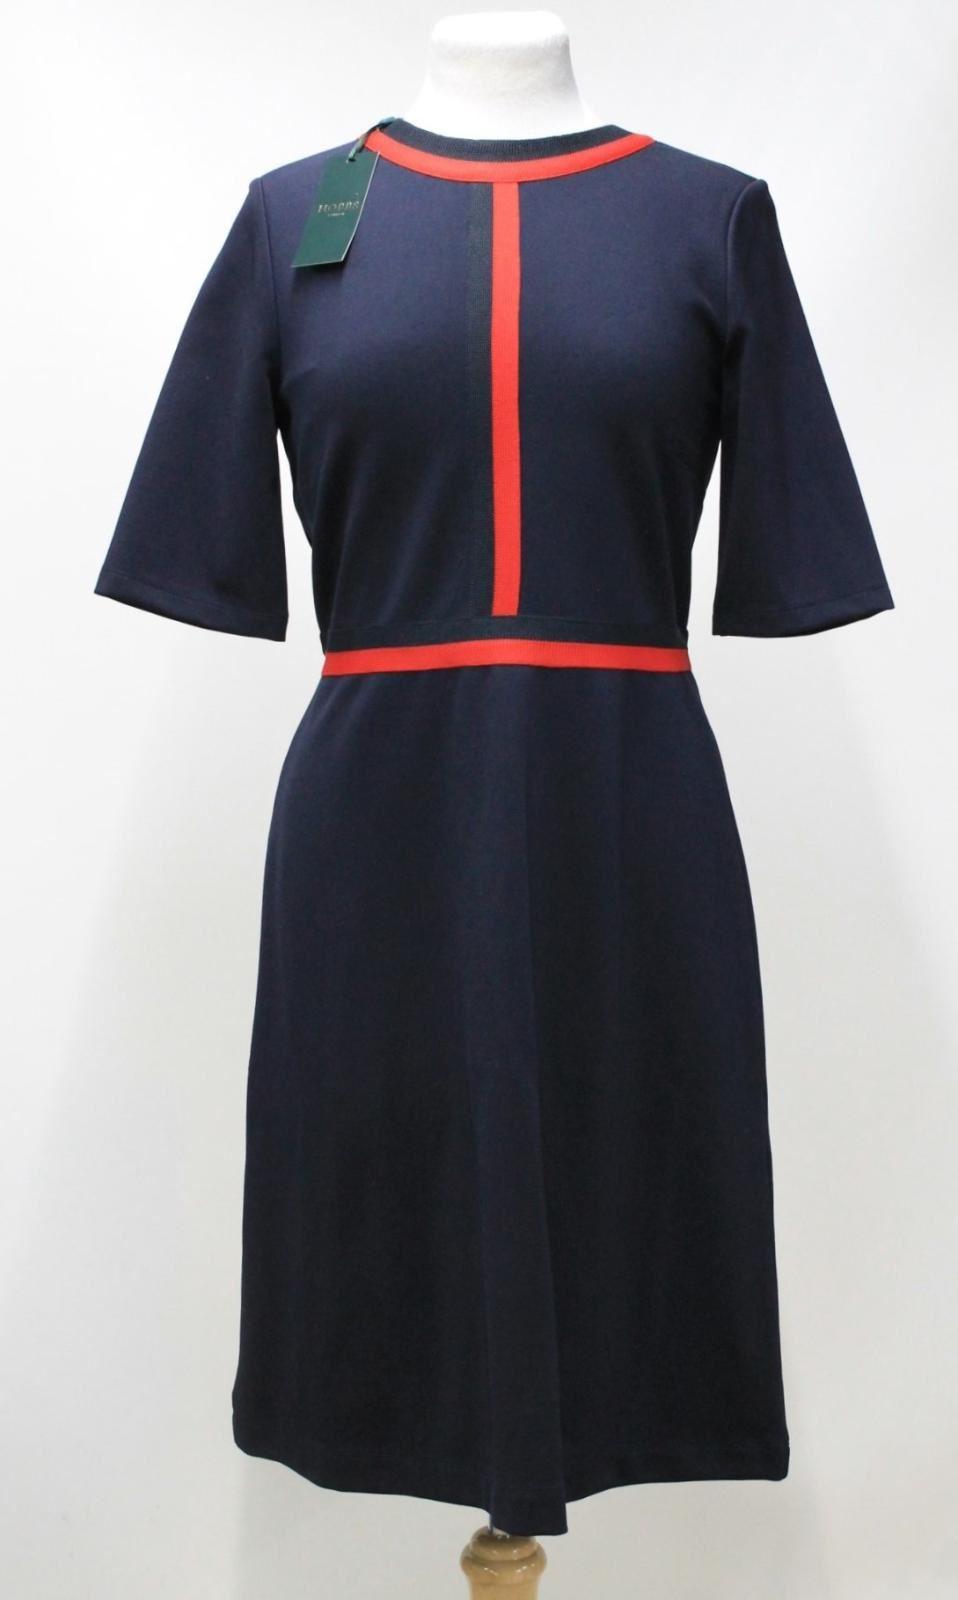 HOBBS-Ladies-Delia-Navy-Red-Stripe-Elbow-Sleeve-Crew-Neck-Shift-Dress-UK10-BNWT